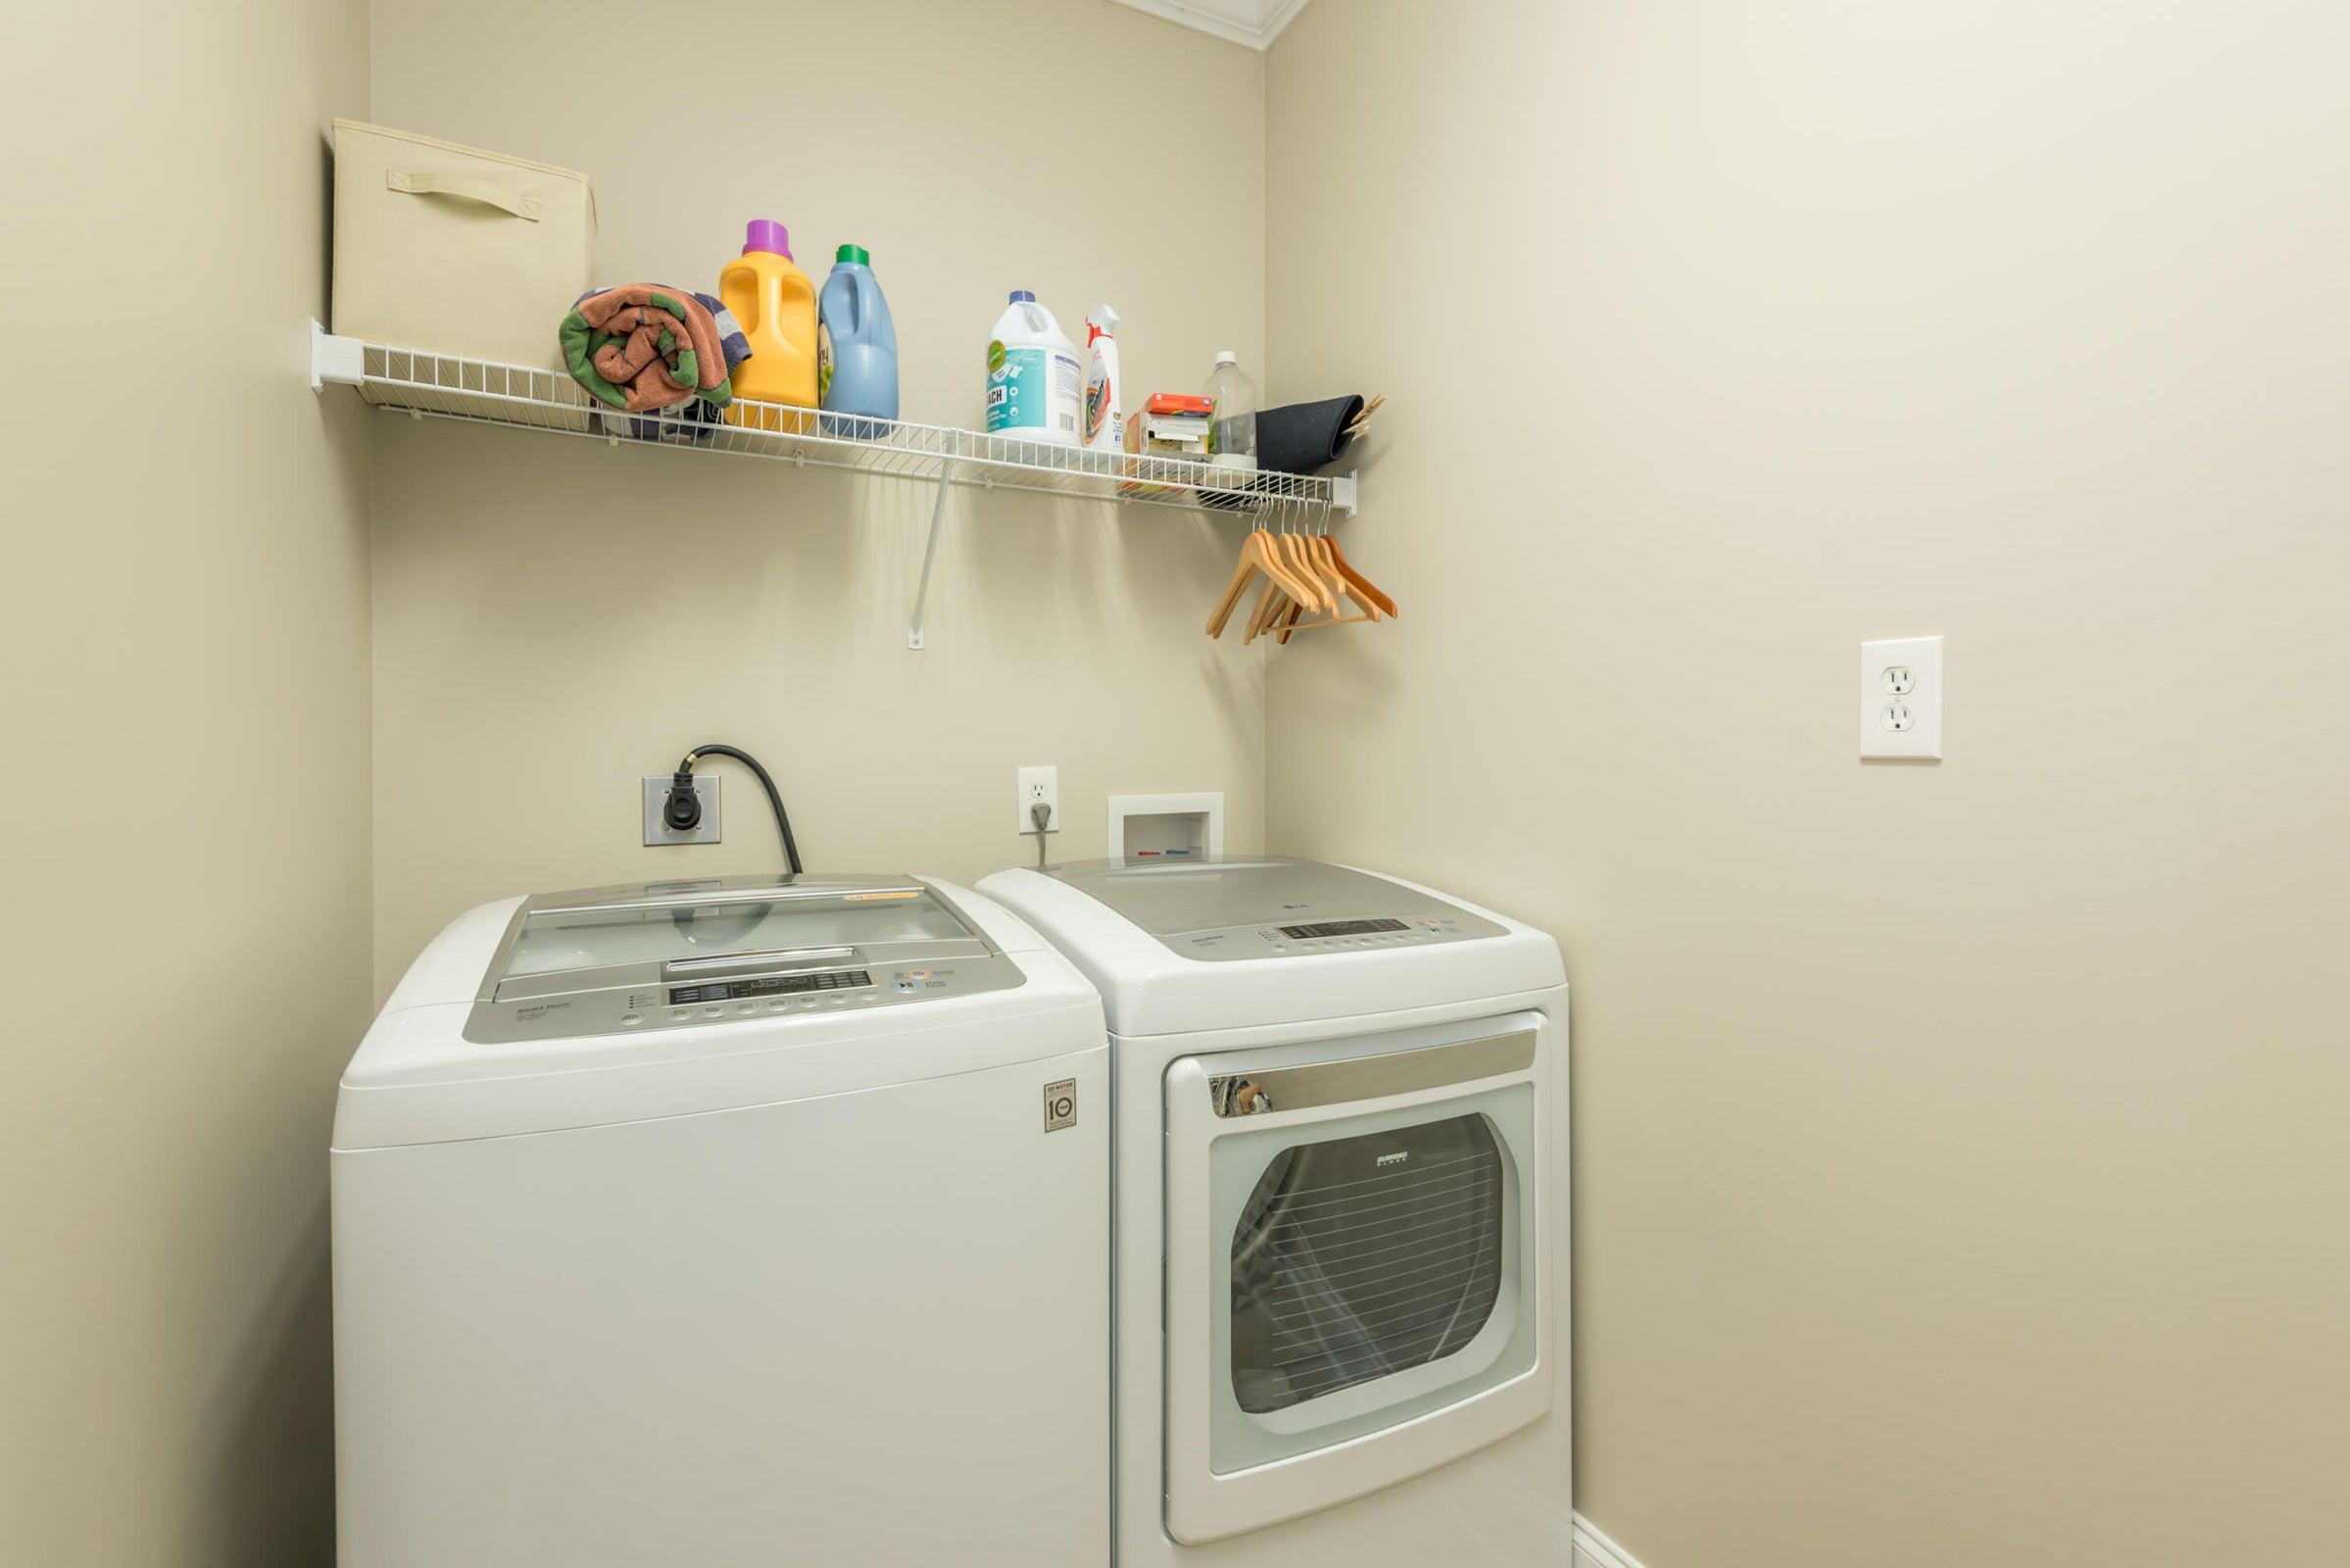 30laundry room